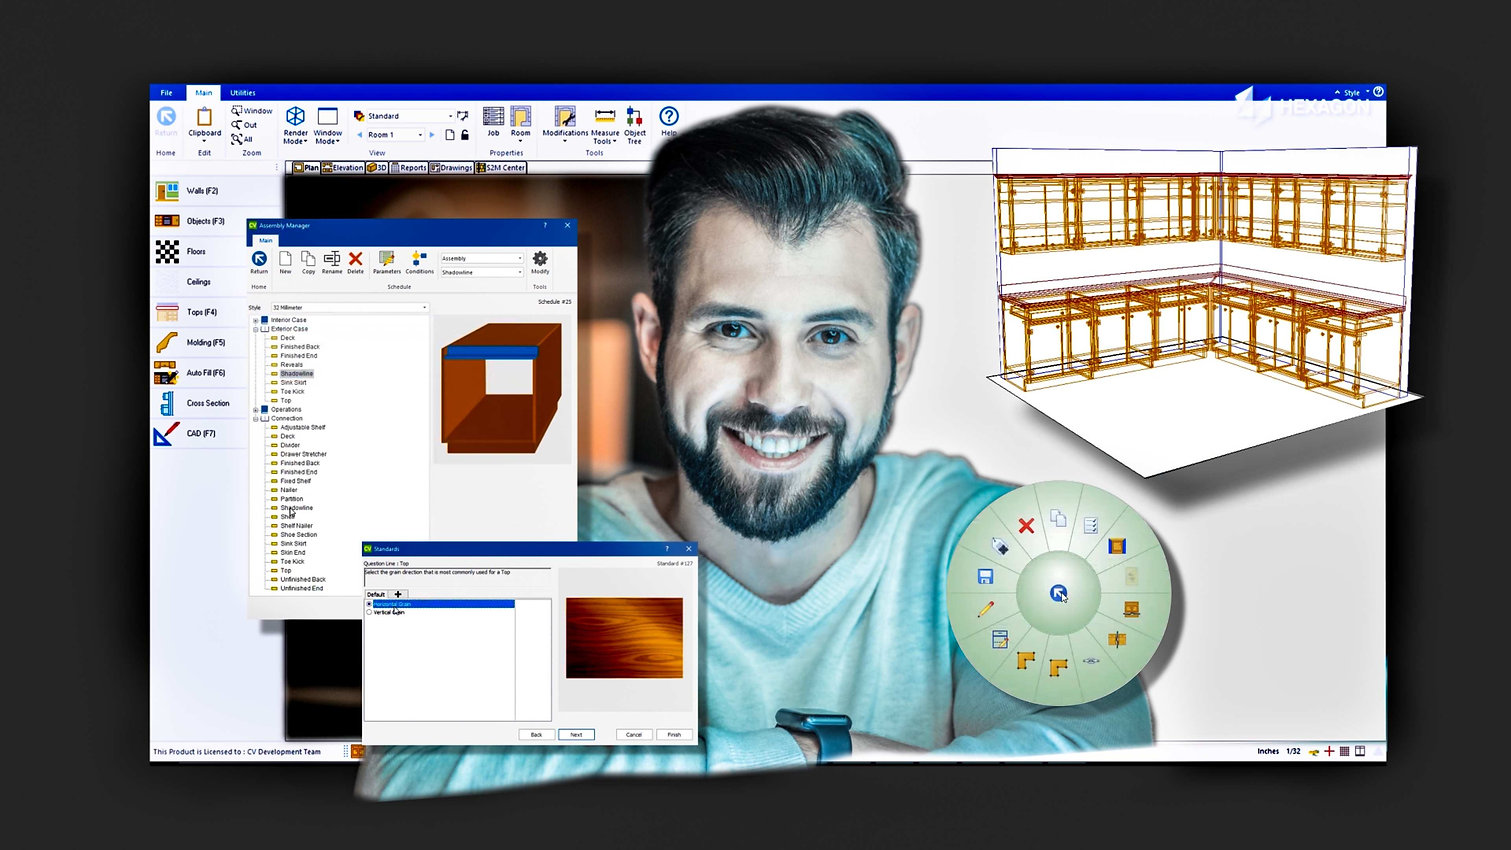 Cabinet-Vision-promo (2).jpg